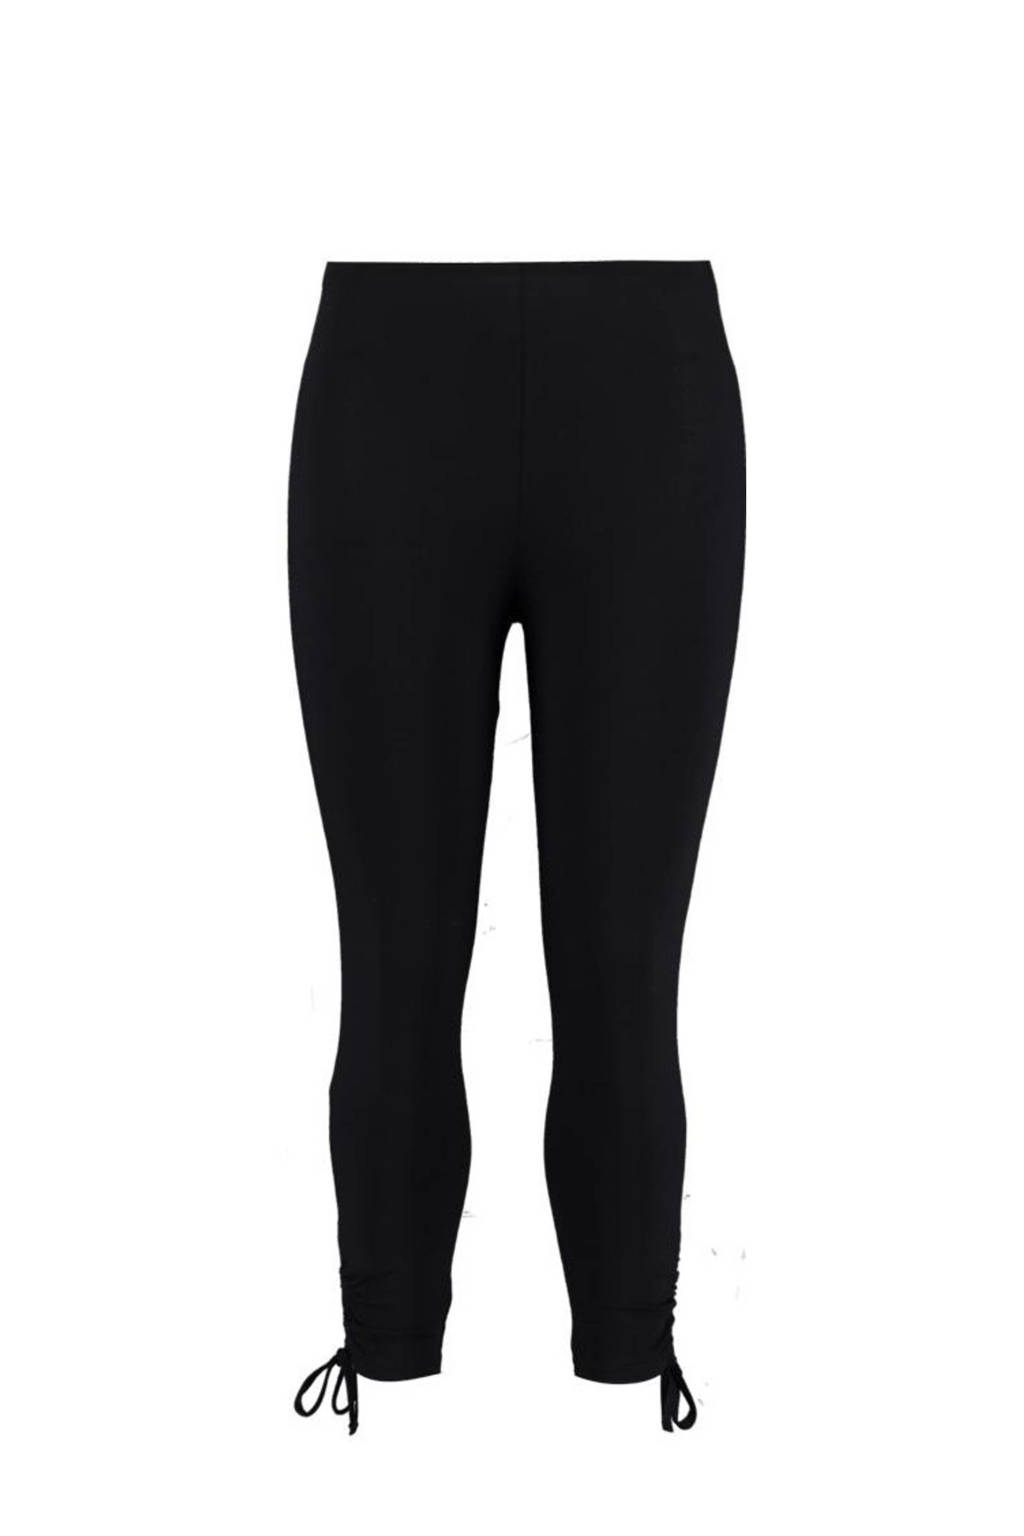 MS Mode legging zwart, Zwart